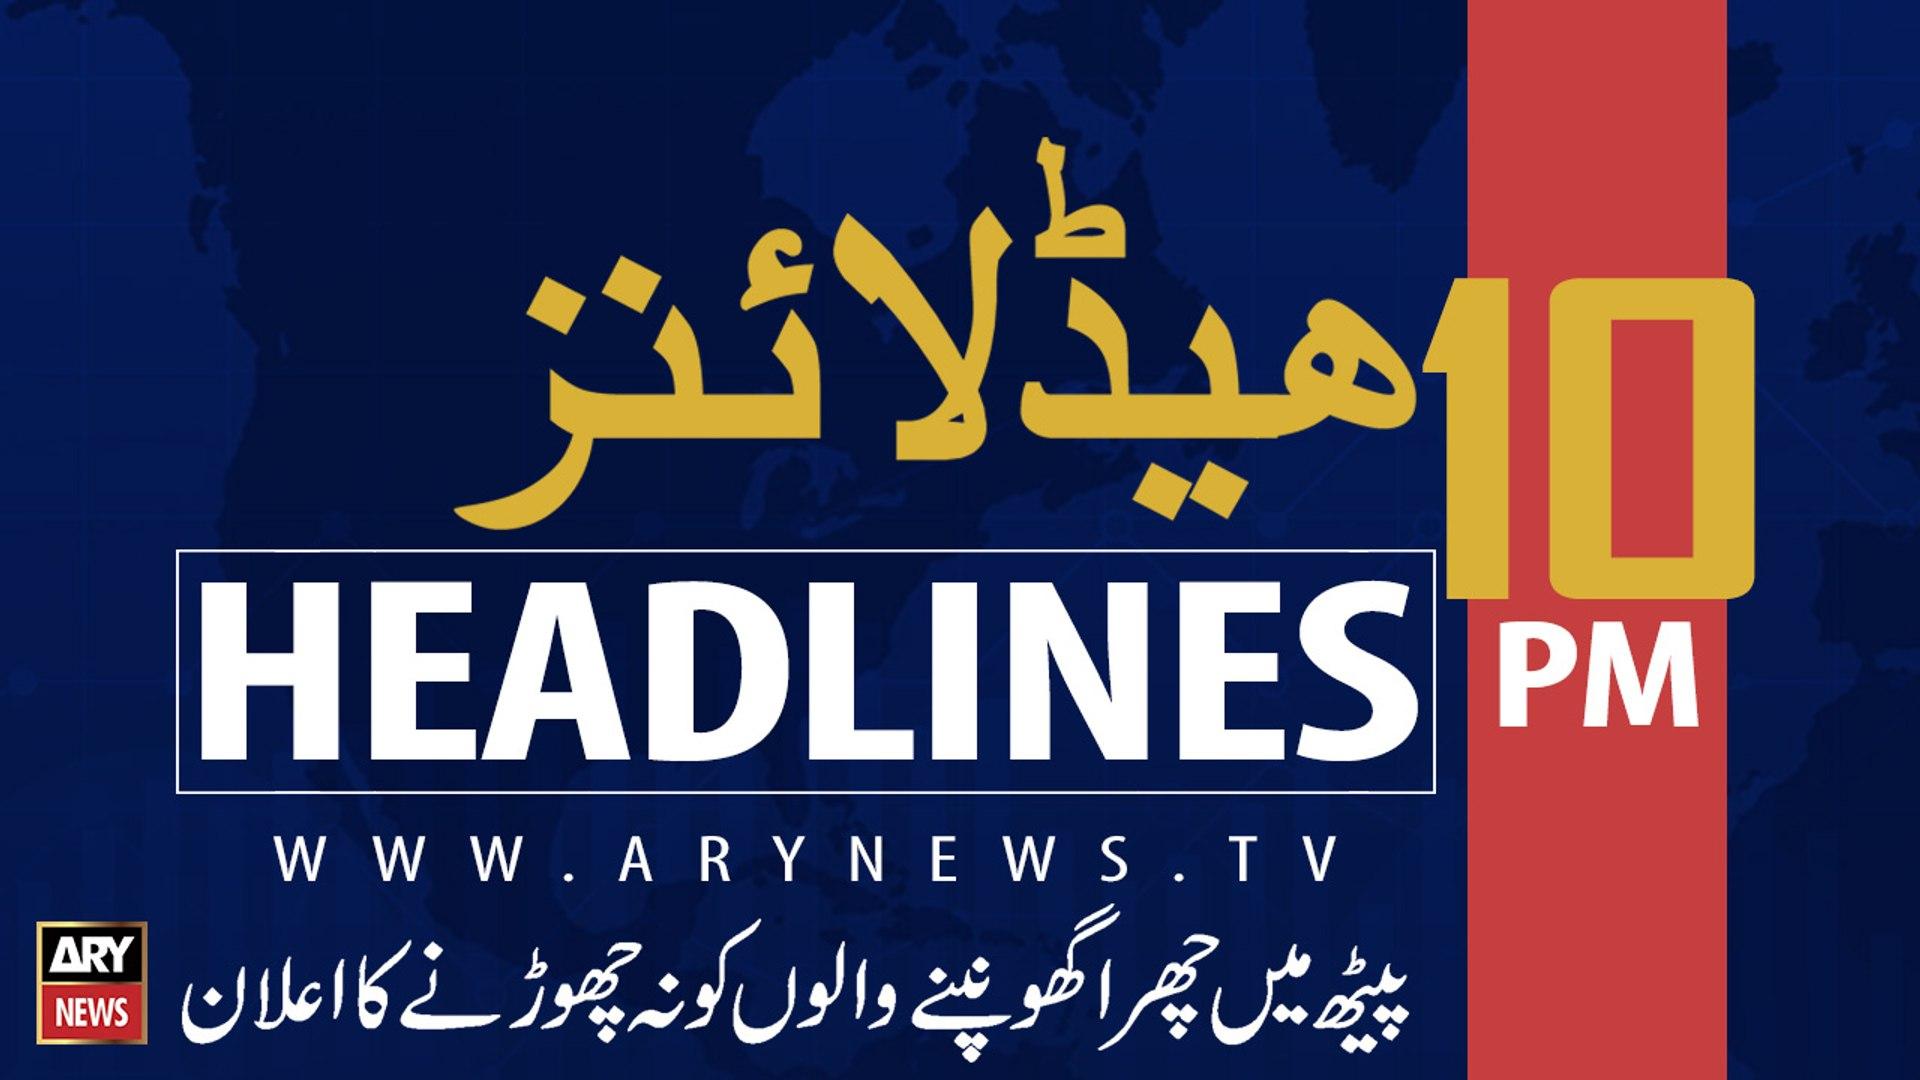 ARY News Headlines | Rangers apprehend six suspects in Karachi | 2200 | 1st August 2019